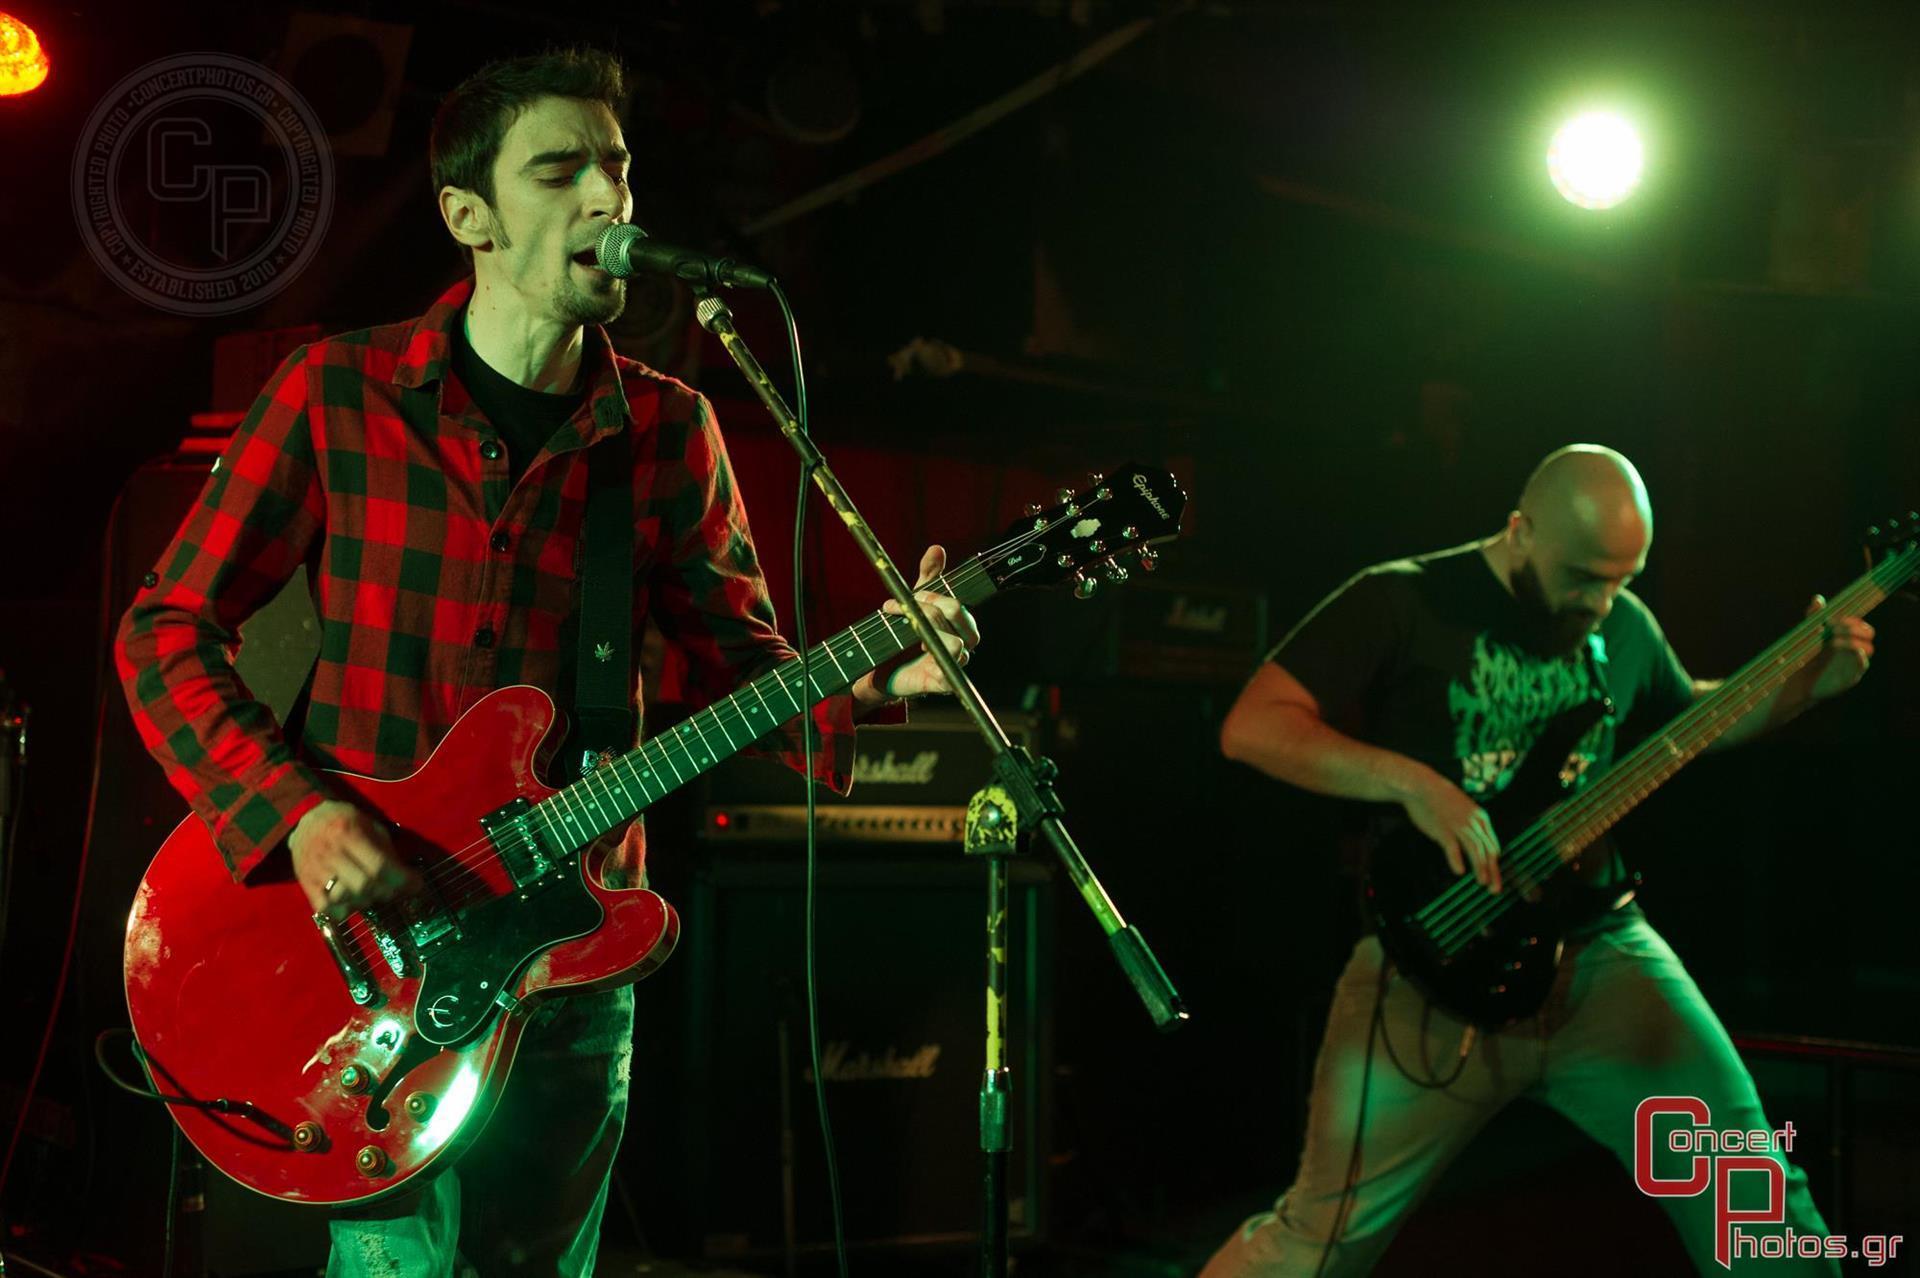 Battle Of The Bands Athens - Leg 3- photographer:  - ConcertPhotos - 20150105_0008_29